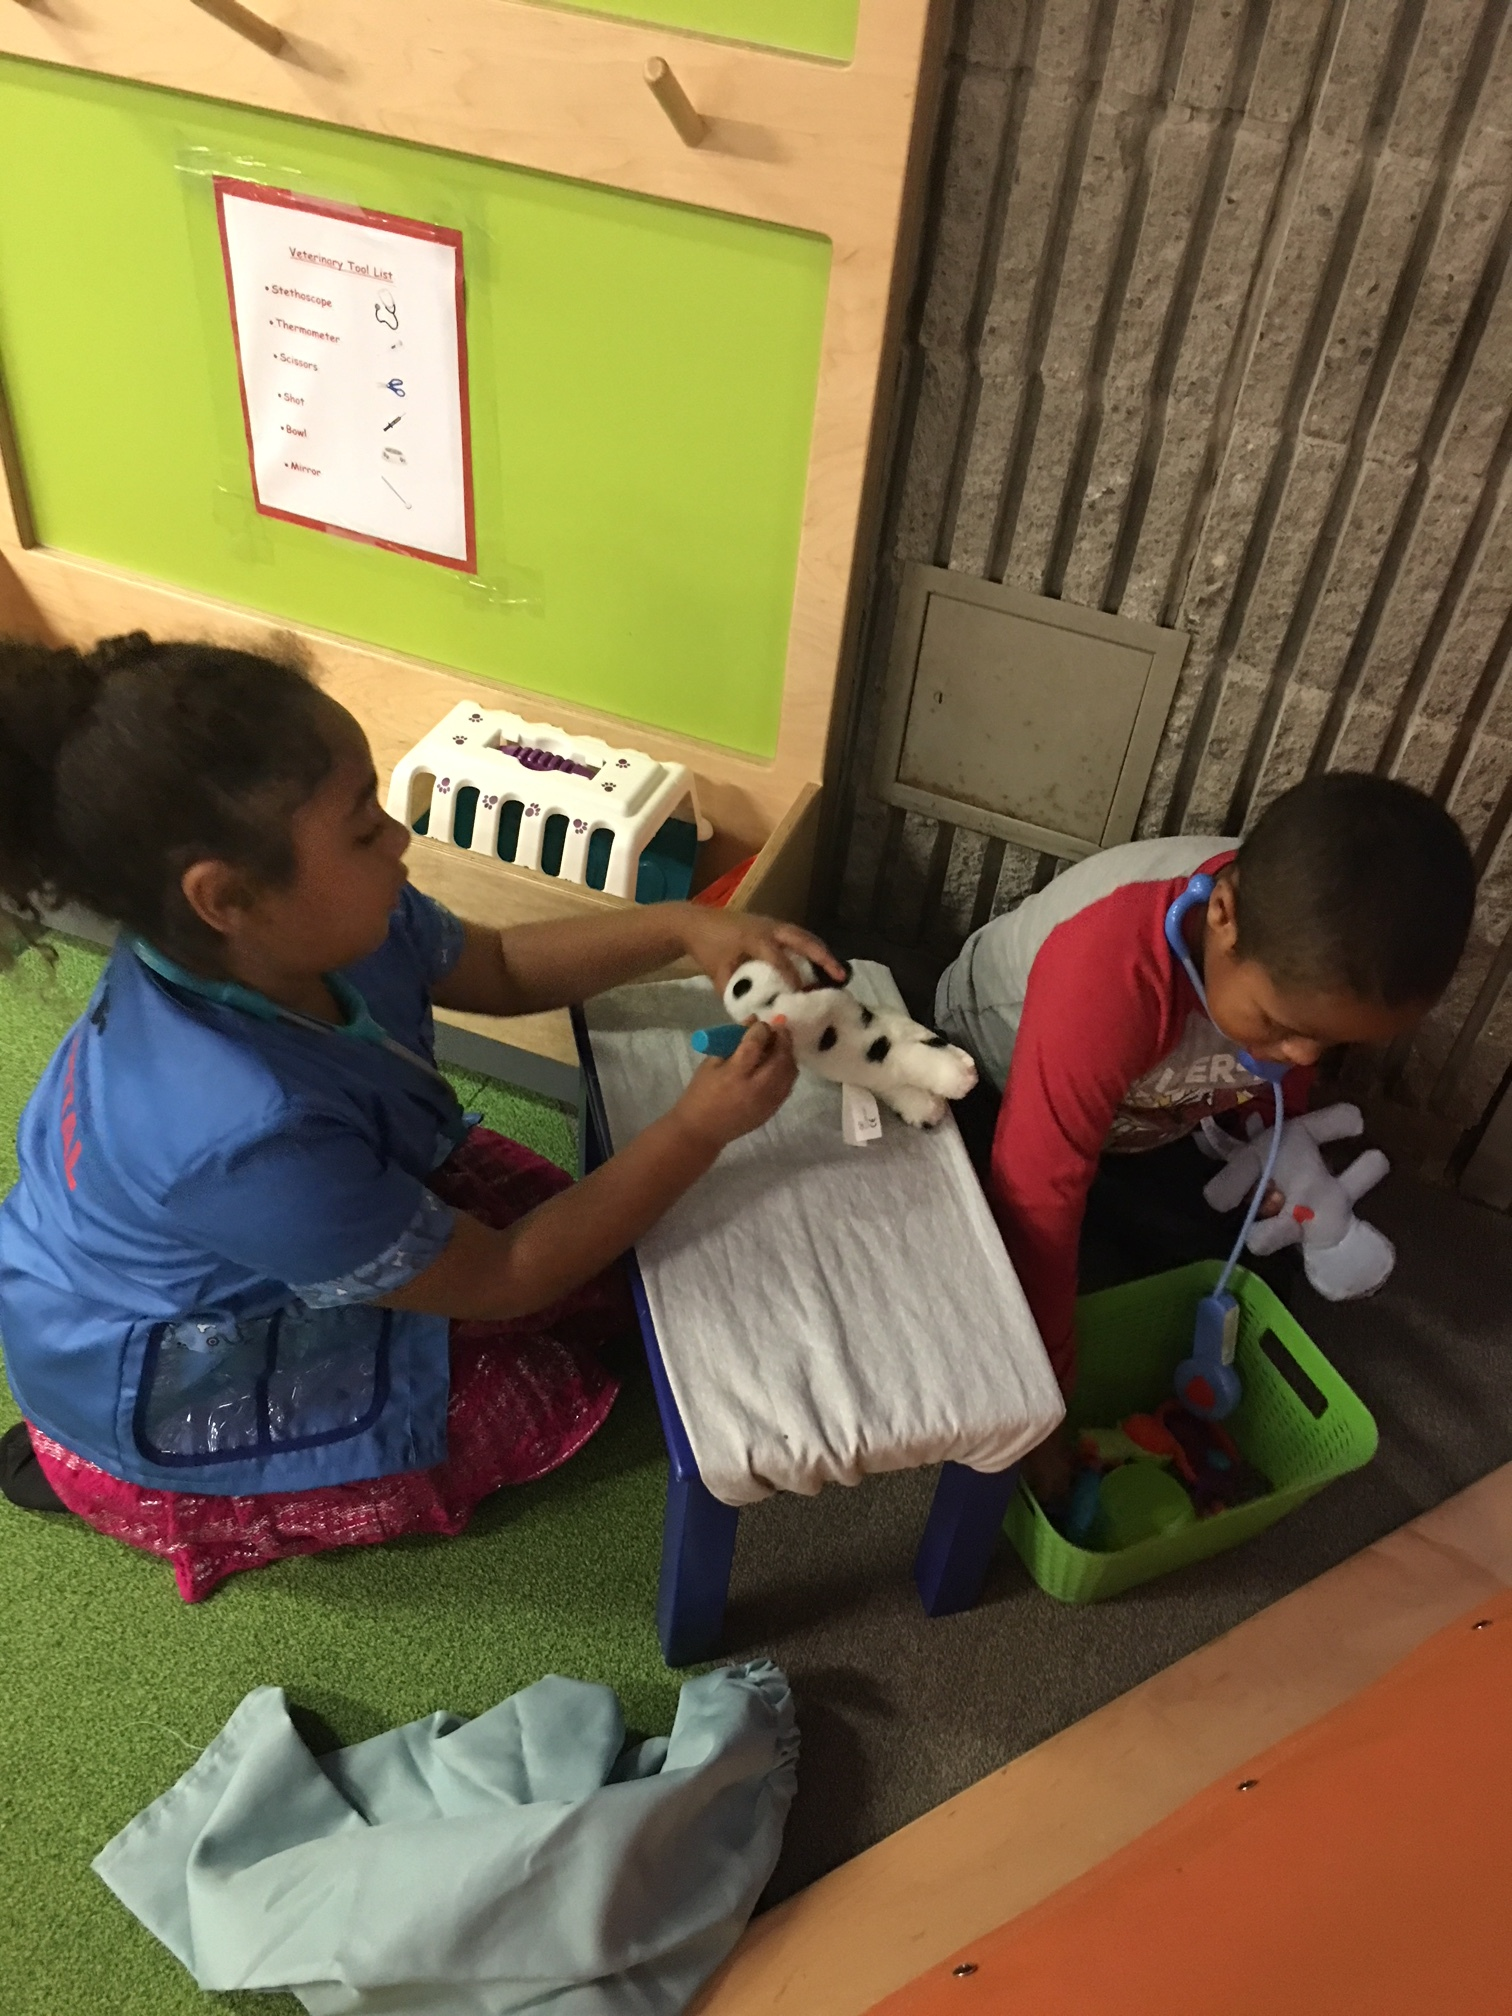 kids playing vet items.JPG